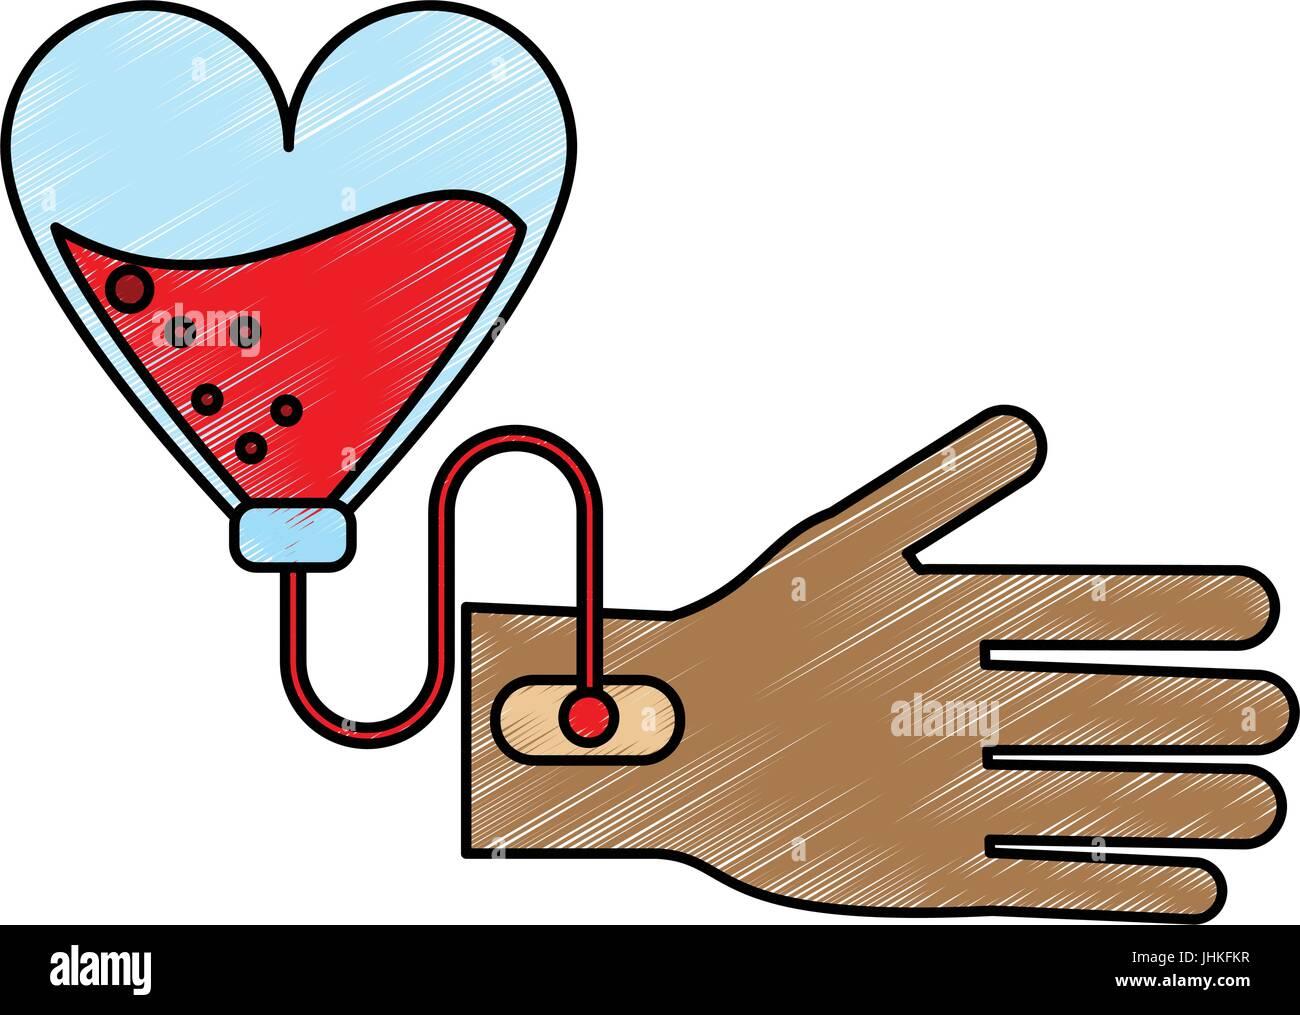 Blood transfusion vector illustration - Stock Image